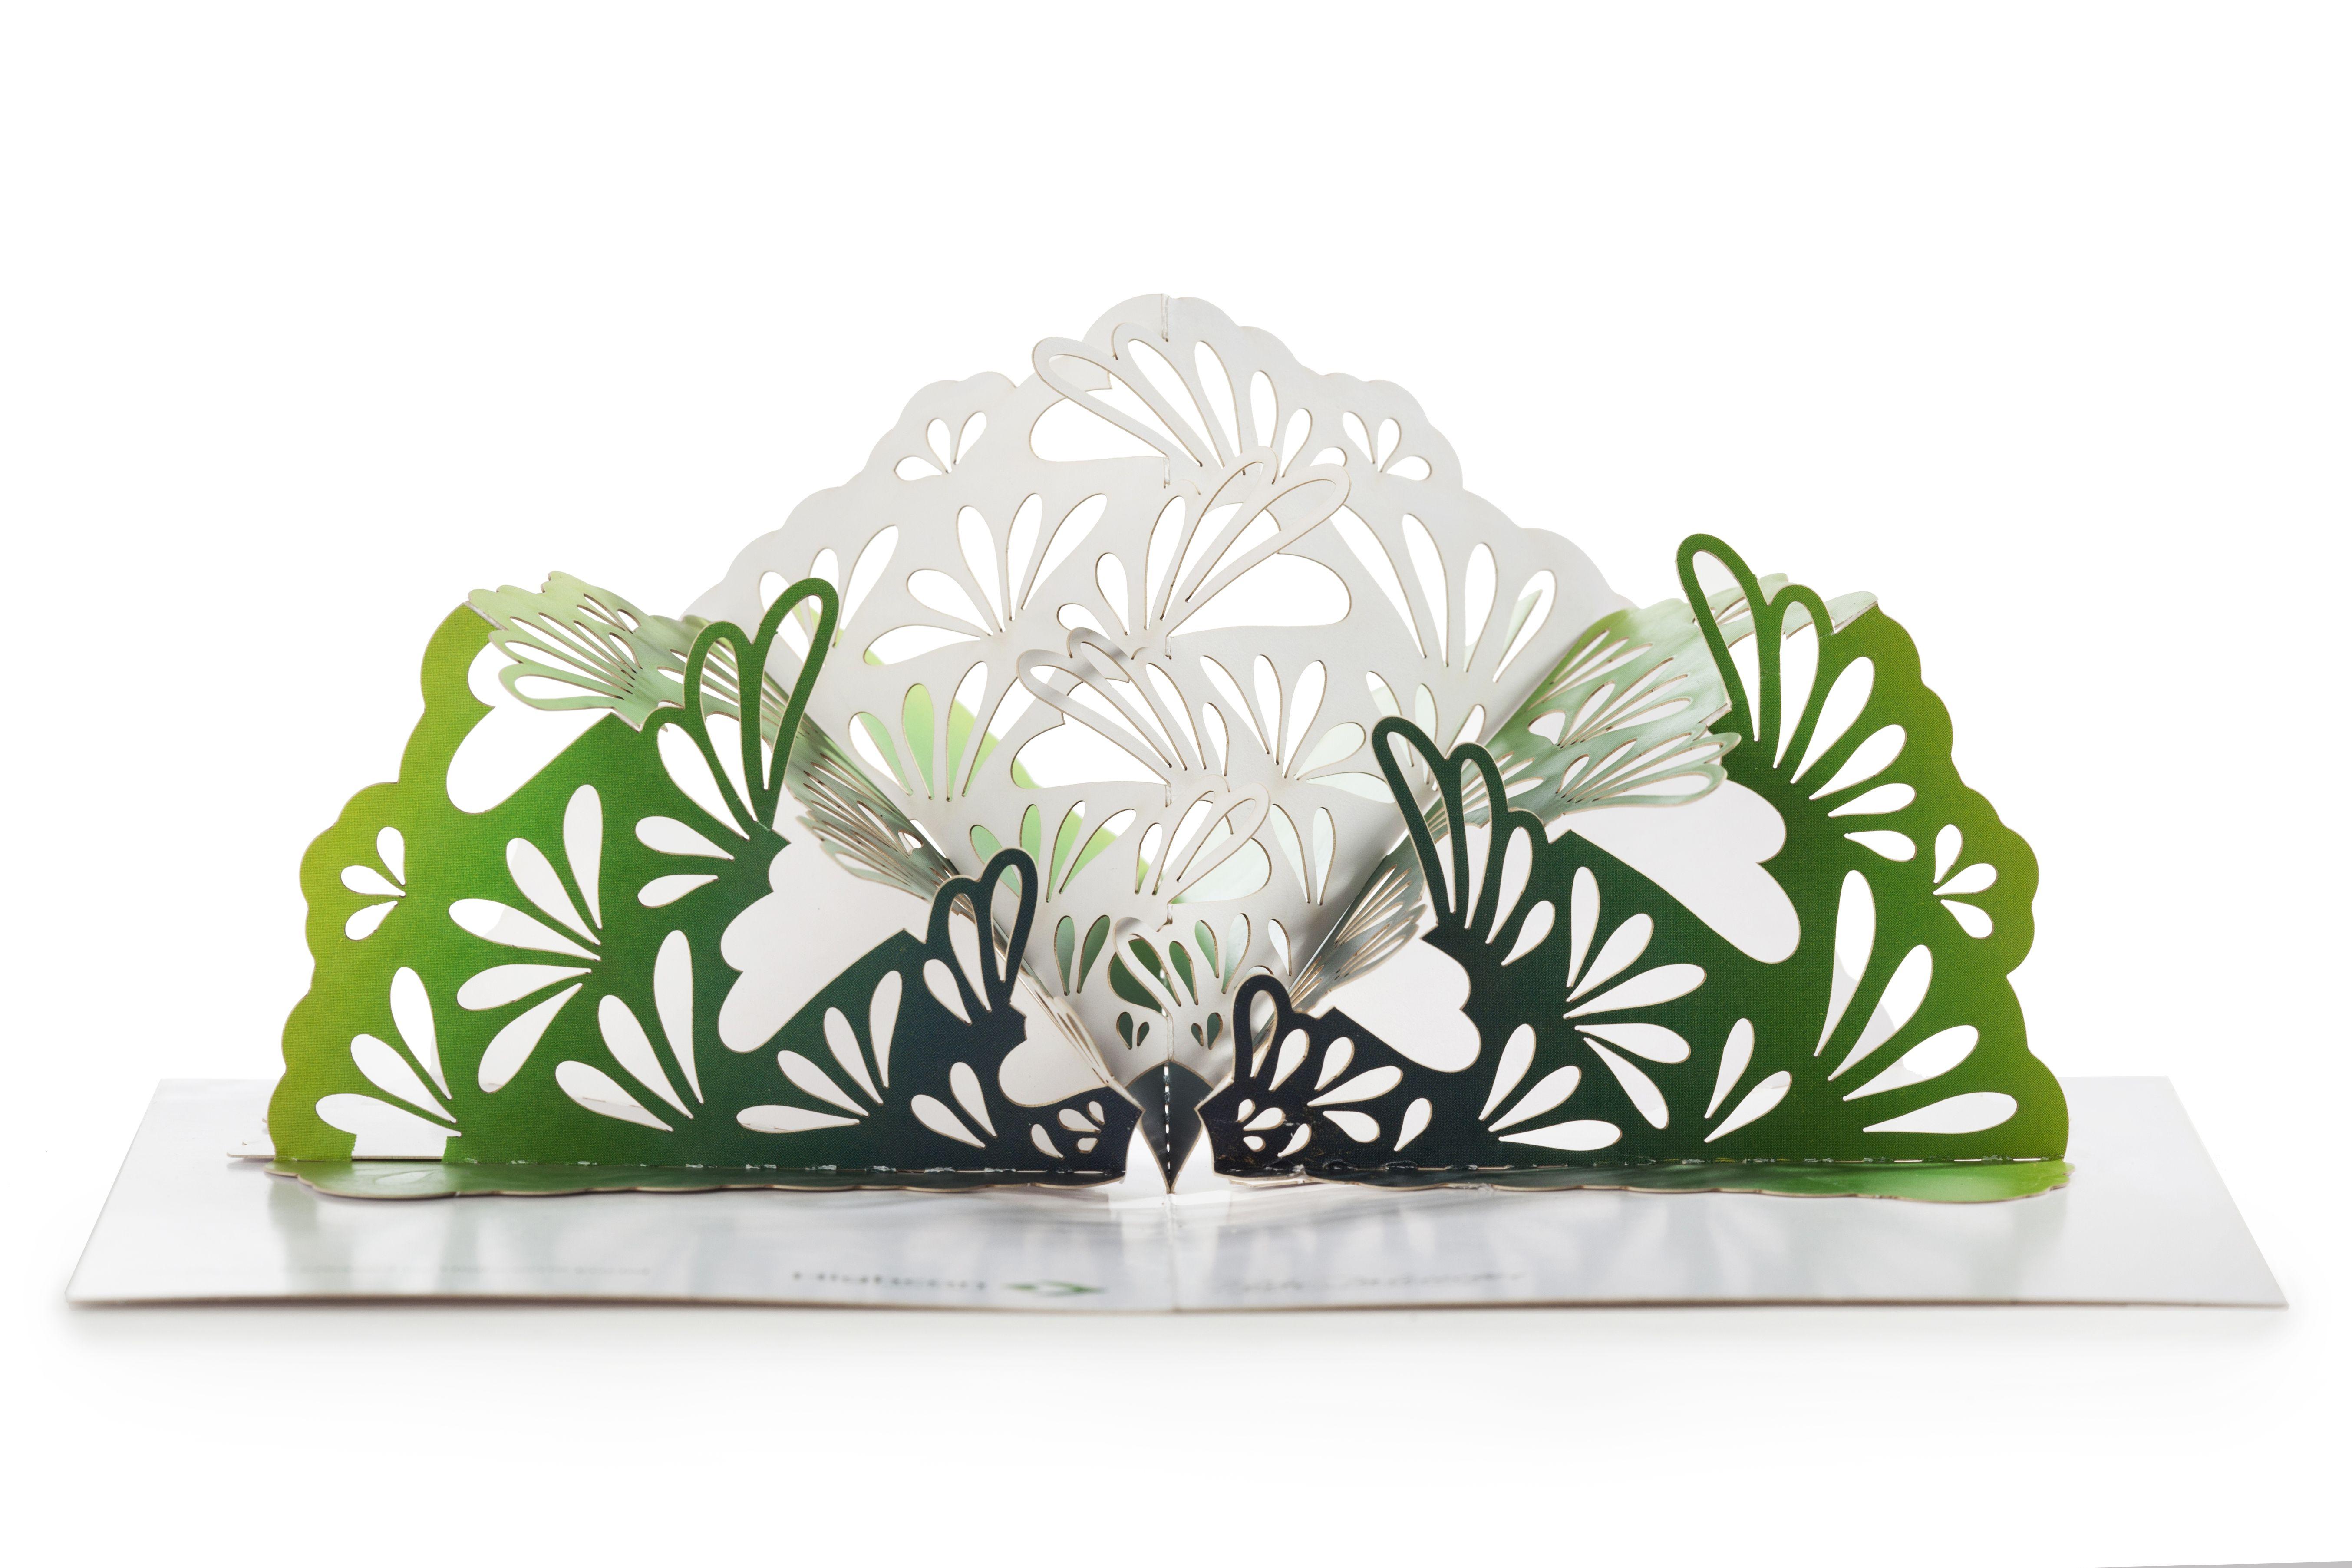 Popup Designed By Peter Dahmen Design On Highcon Pinterest - Elaborate pop paper sculptures peter dahmen